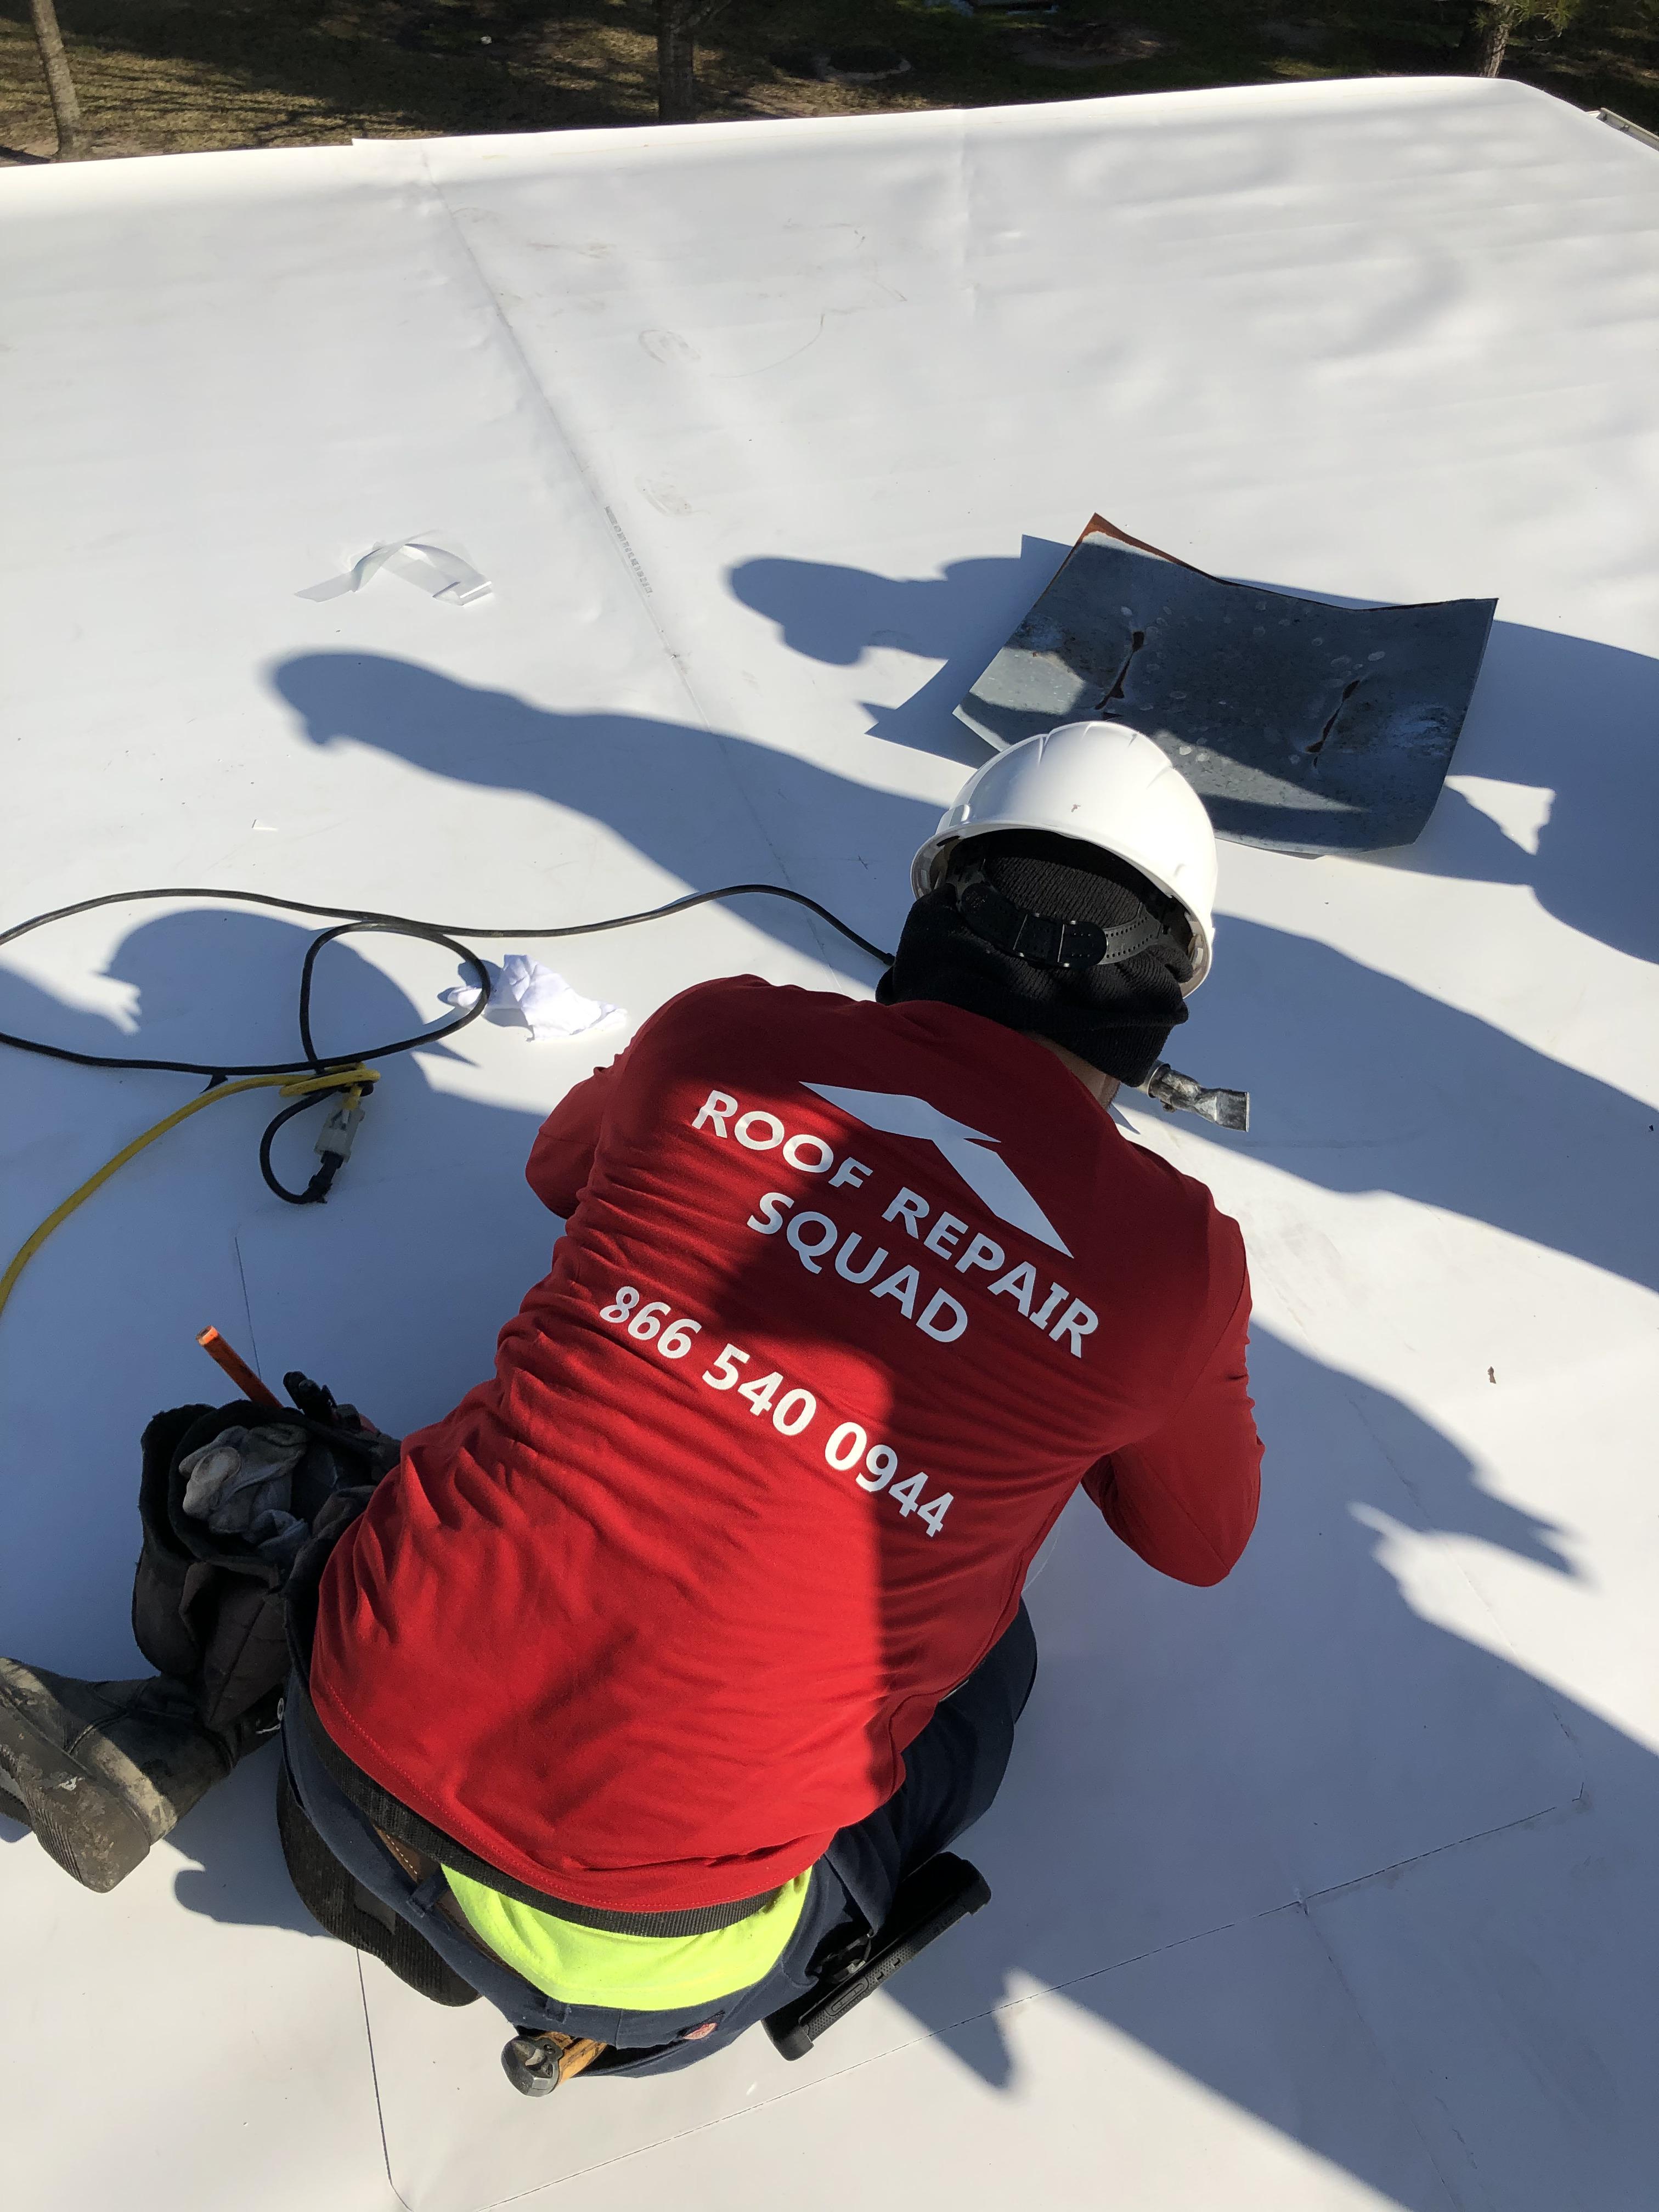 Roof Repair Squad Inspection